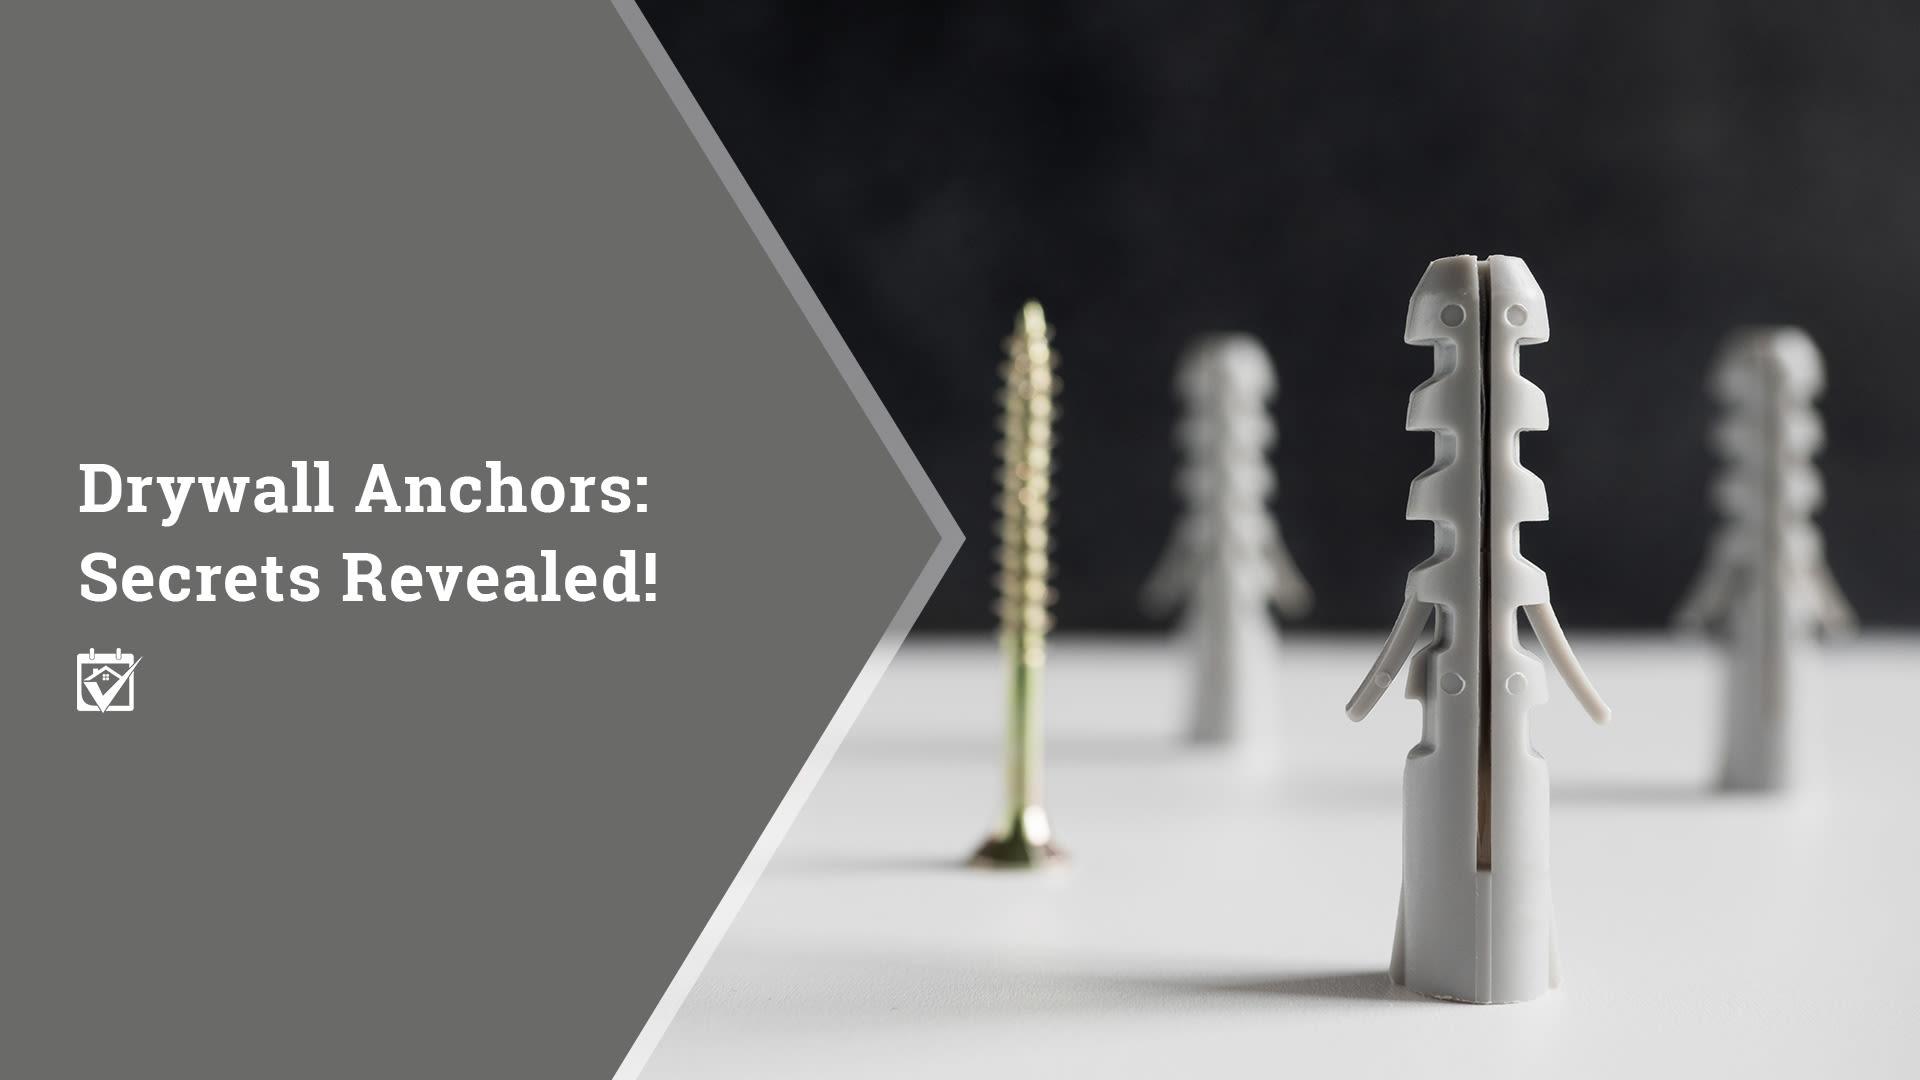 Drywall Anchors: Secrets Revealed!